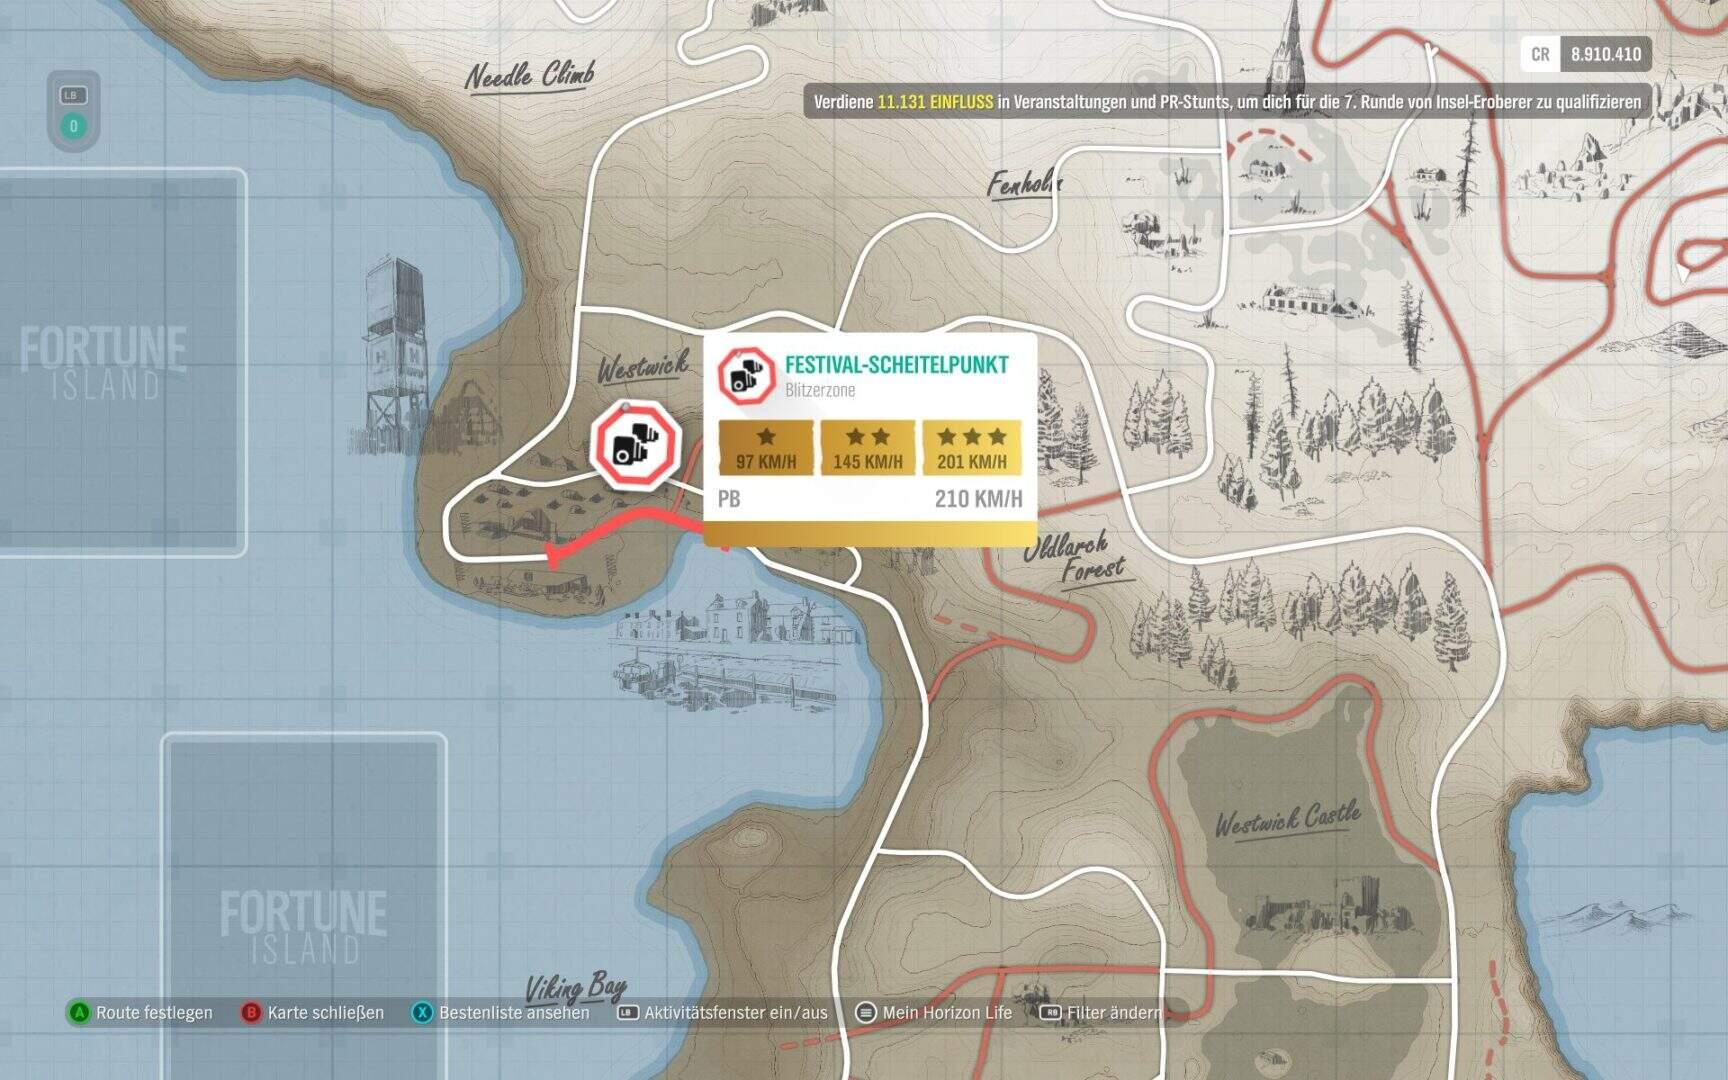 Forza Horizon 4 Fortune Island Festival Scheitelpunkt Blitzerzone